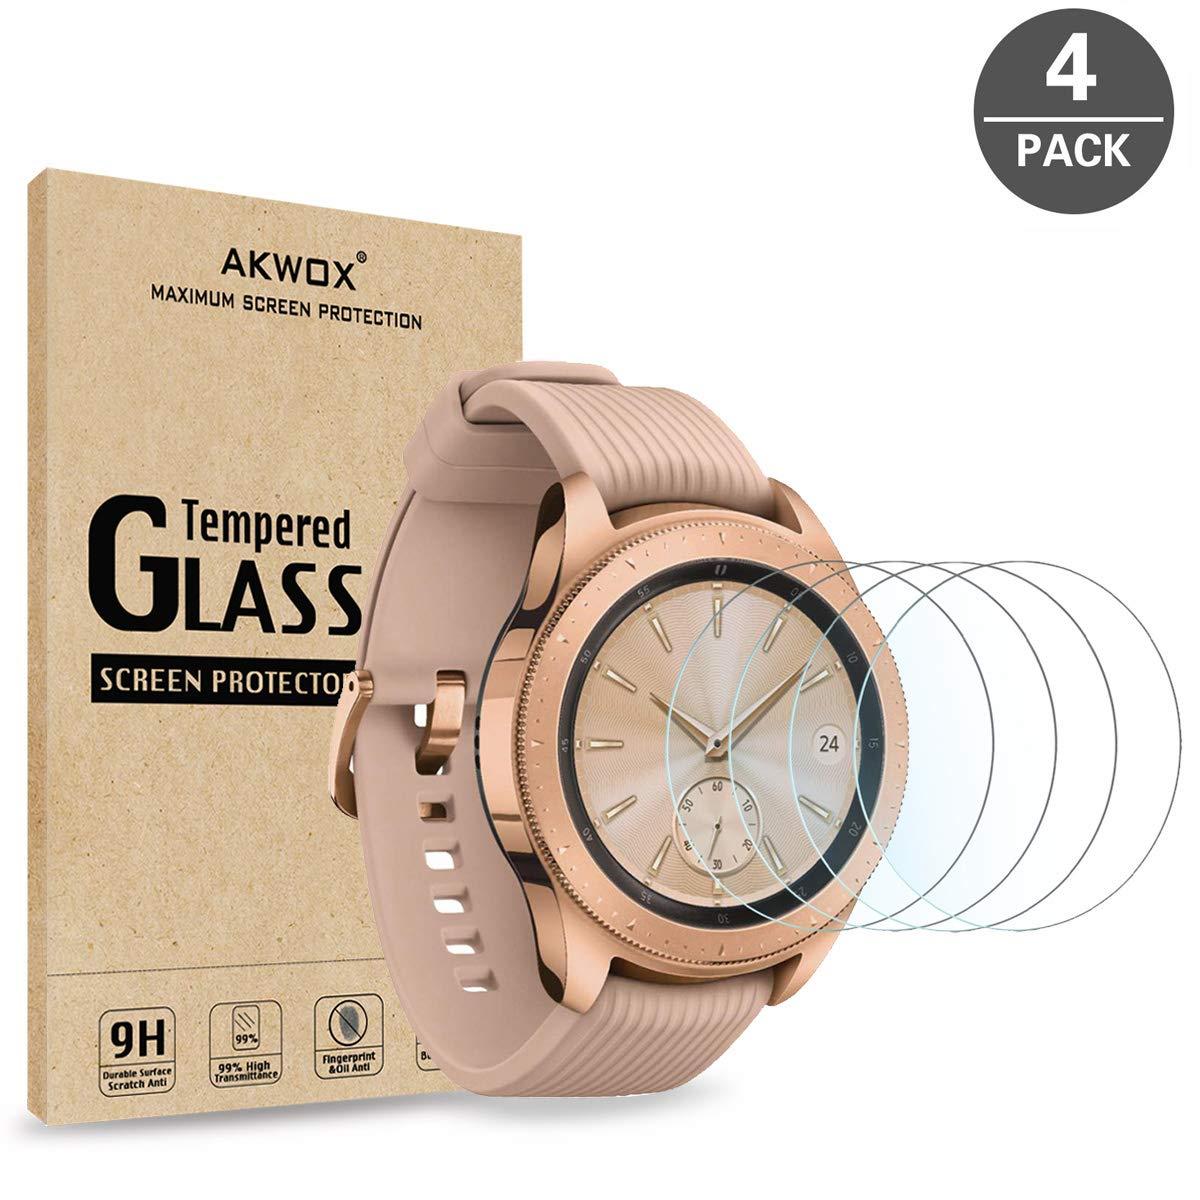 Vidrio Protector para Samsung Gear S2 x4 AKWOX -7GQZWF6G